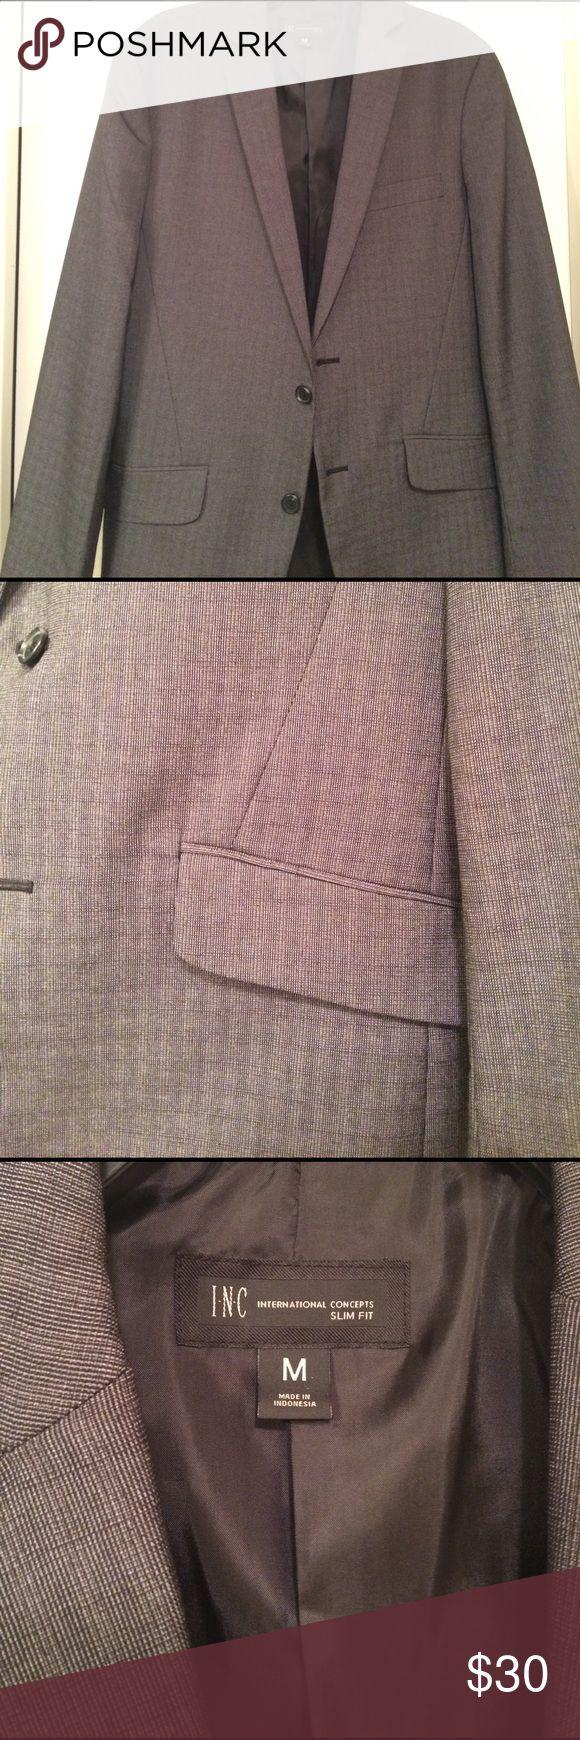 Inc slim fit blazer medium 38-40 charcoal plaid Used charcoal plaid inc blazer. Fits a 38-40 jacket size INC International Concepts Suits & Blazers Sport Coats & Blazers